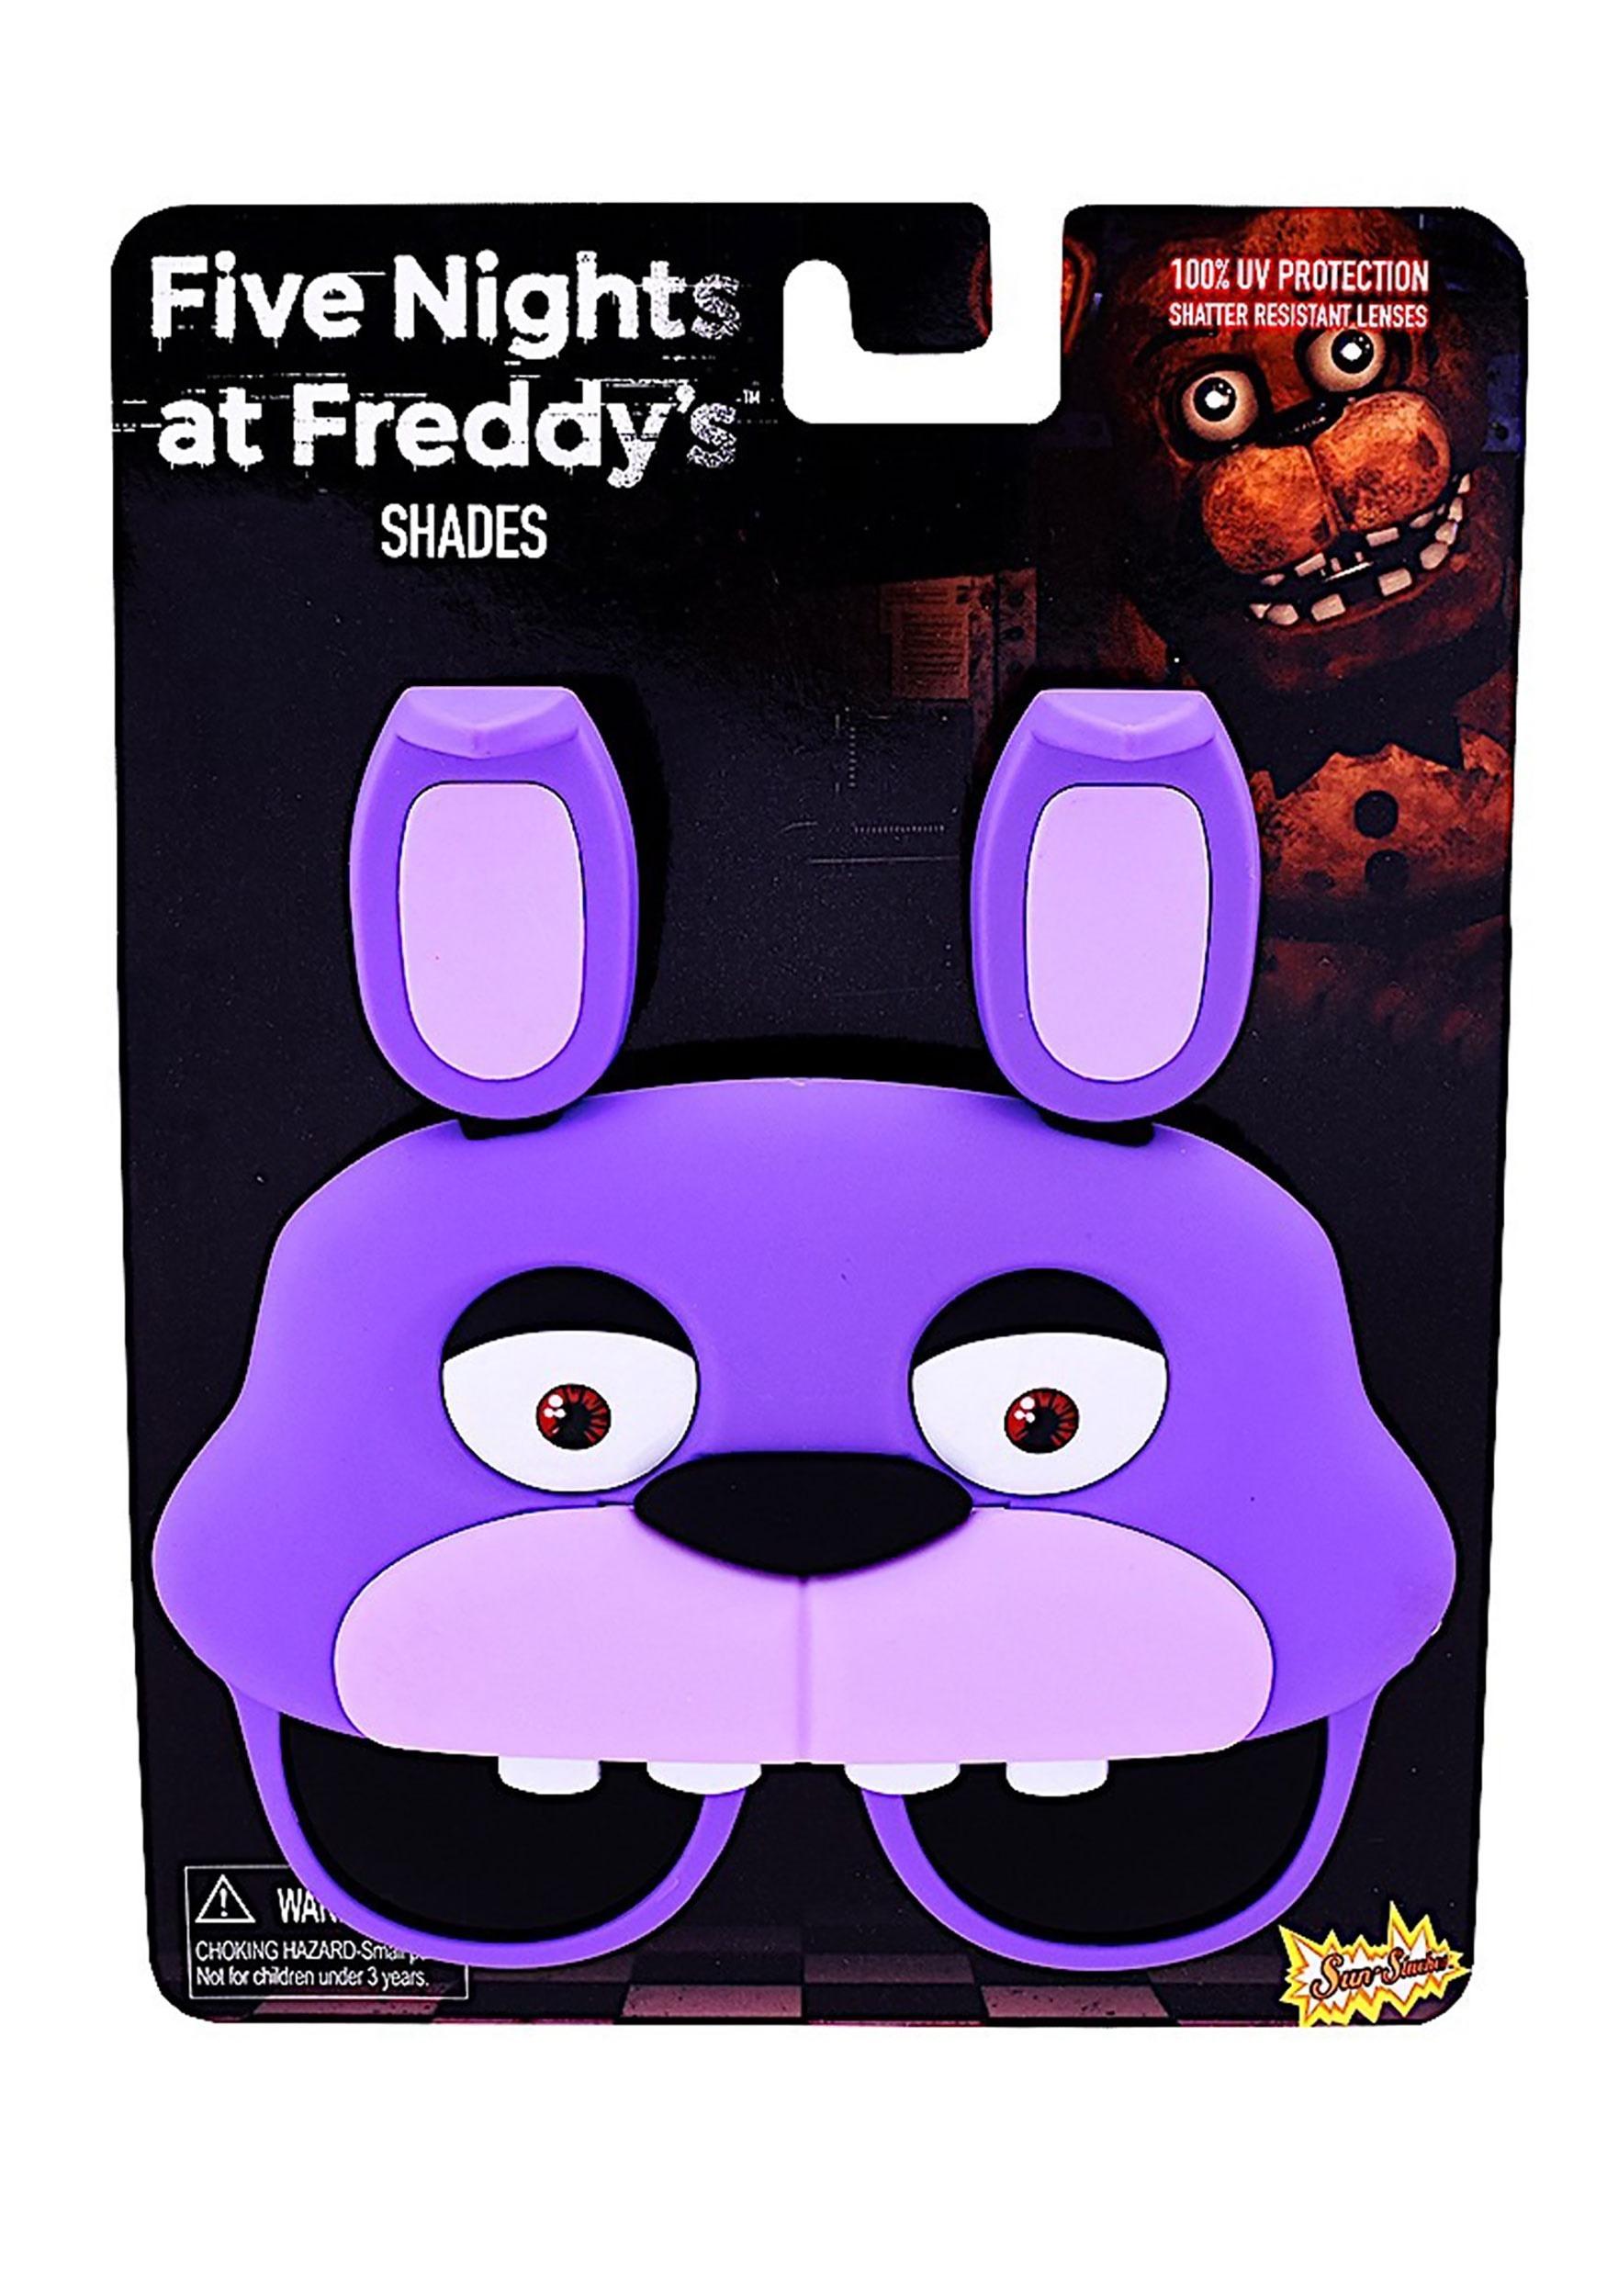 Five Nights at Freddy's Chica Sunglasses Standard mVTObN4joe